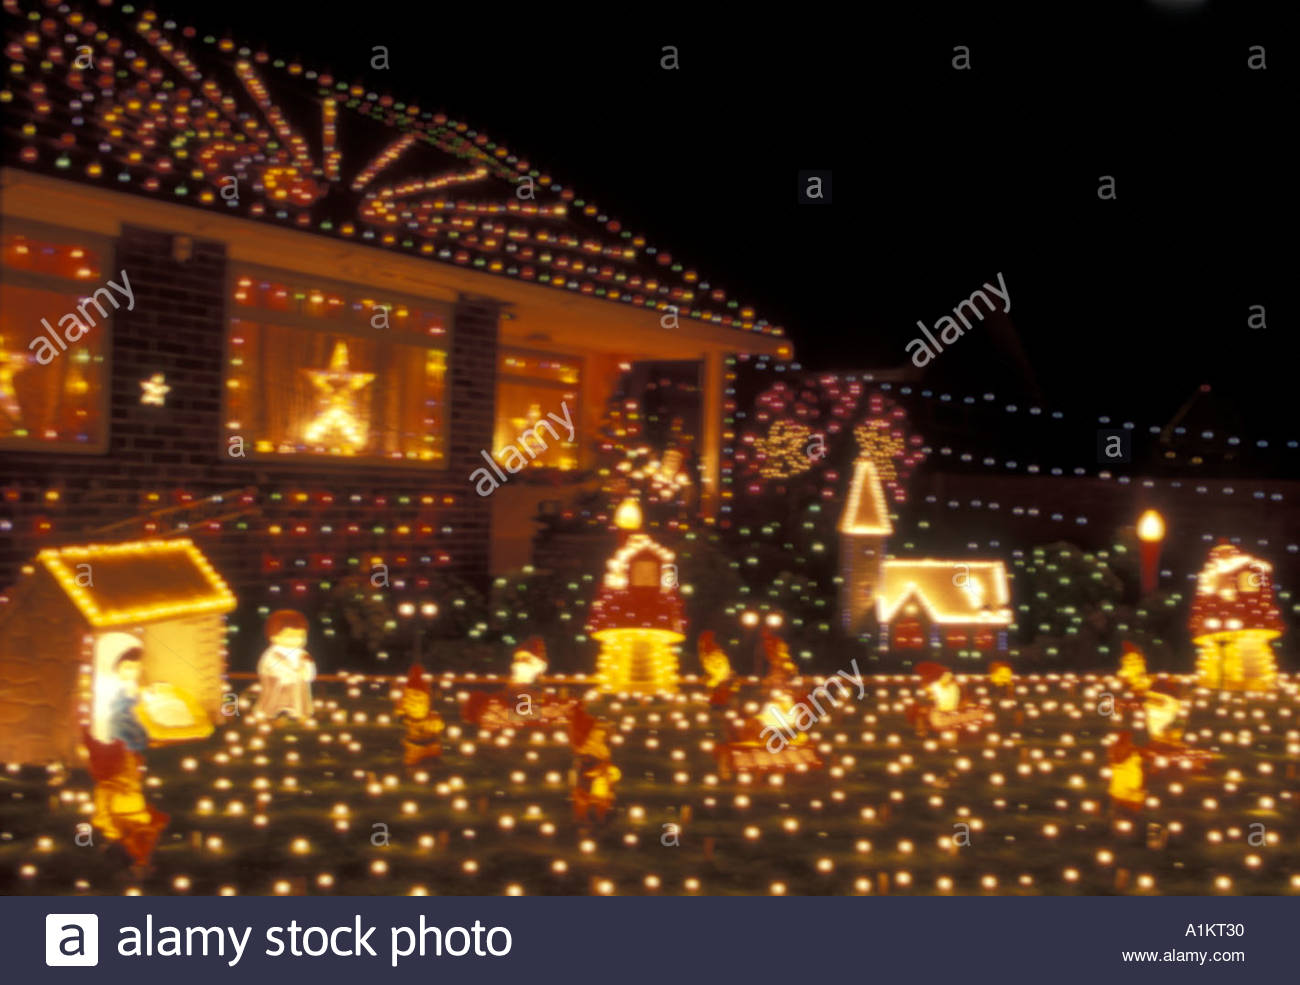 Christmas Lights On Houses.Christmas Lights On Houses In Lowestoft Norfolk Uk Stock